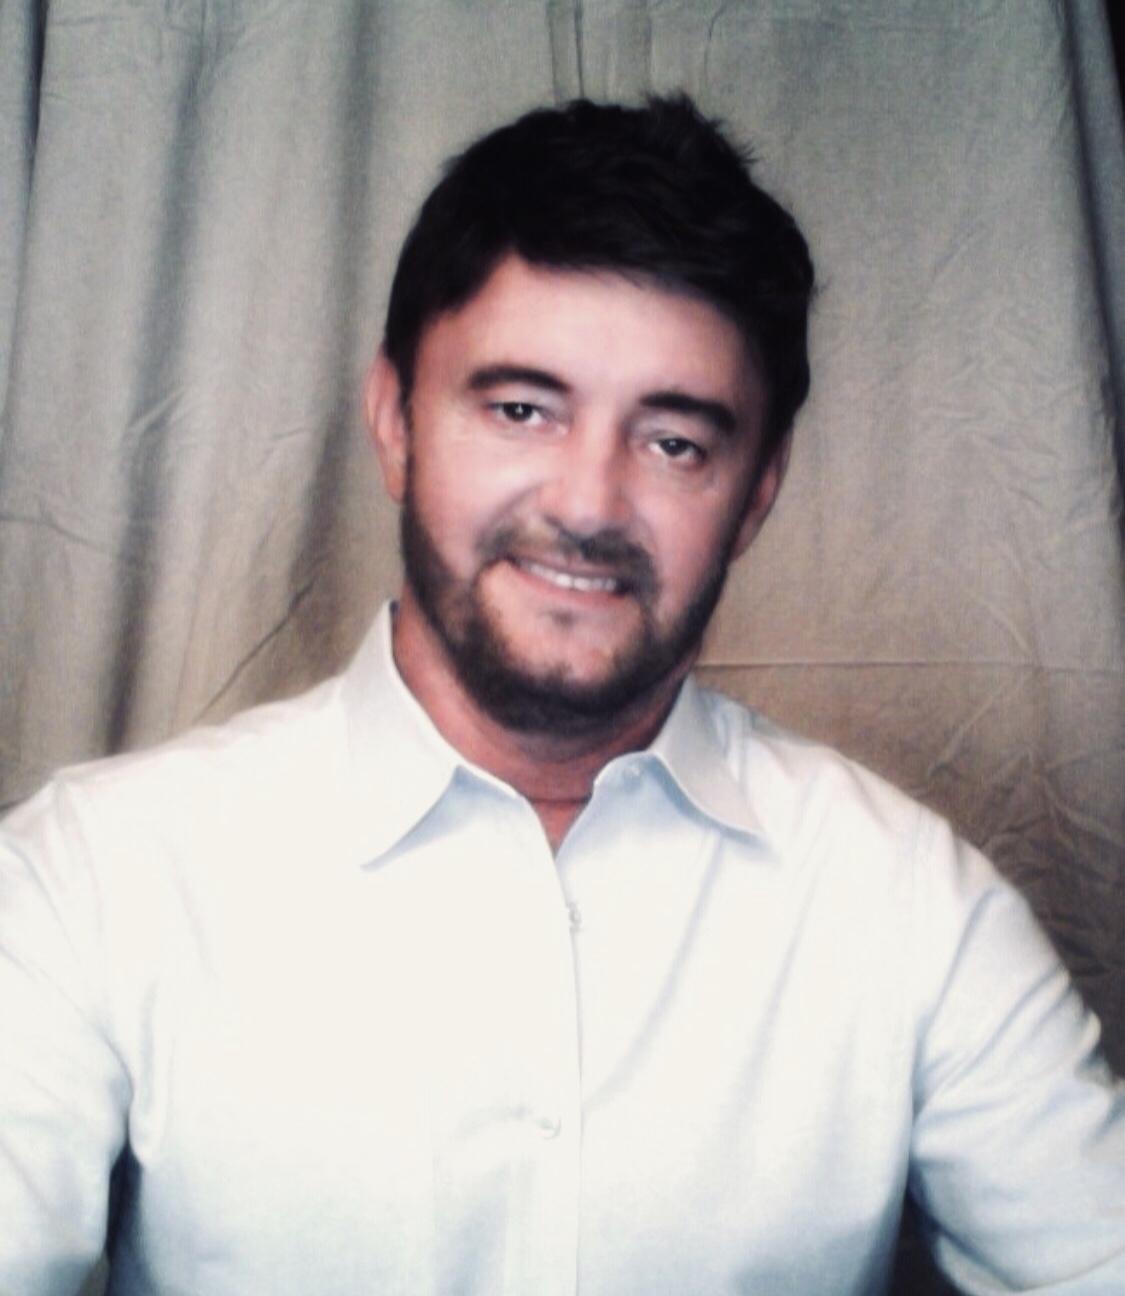 Scott Wisuri